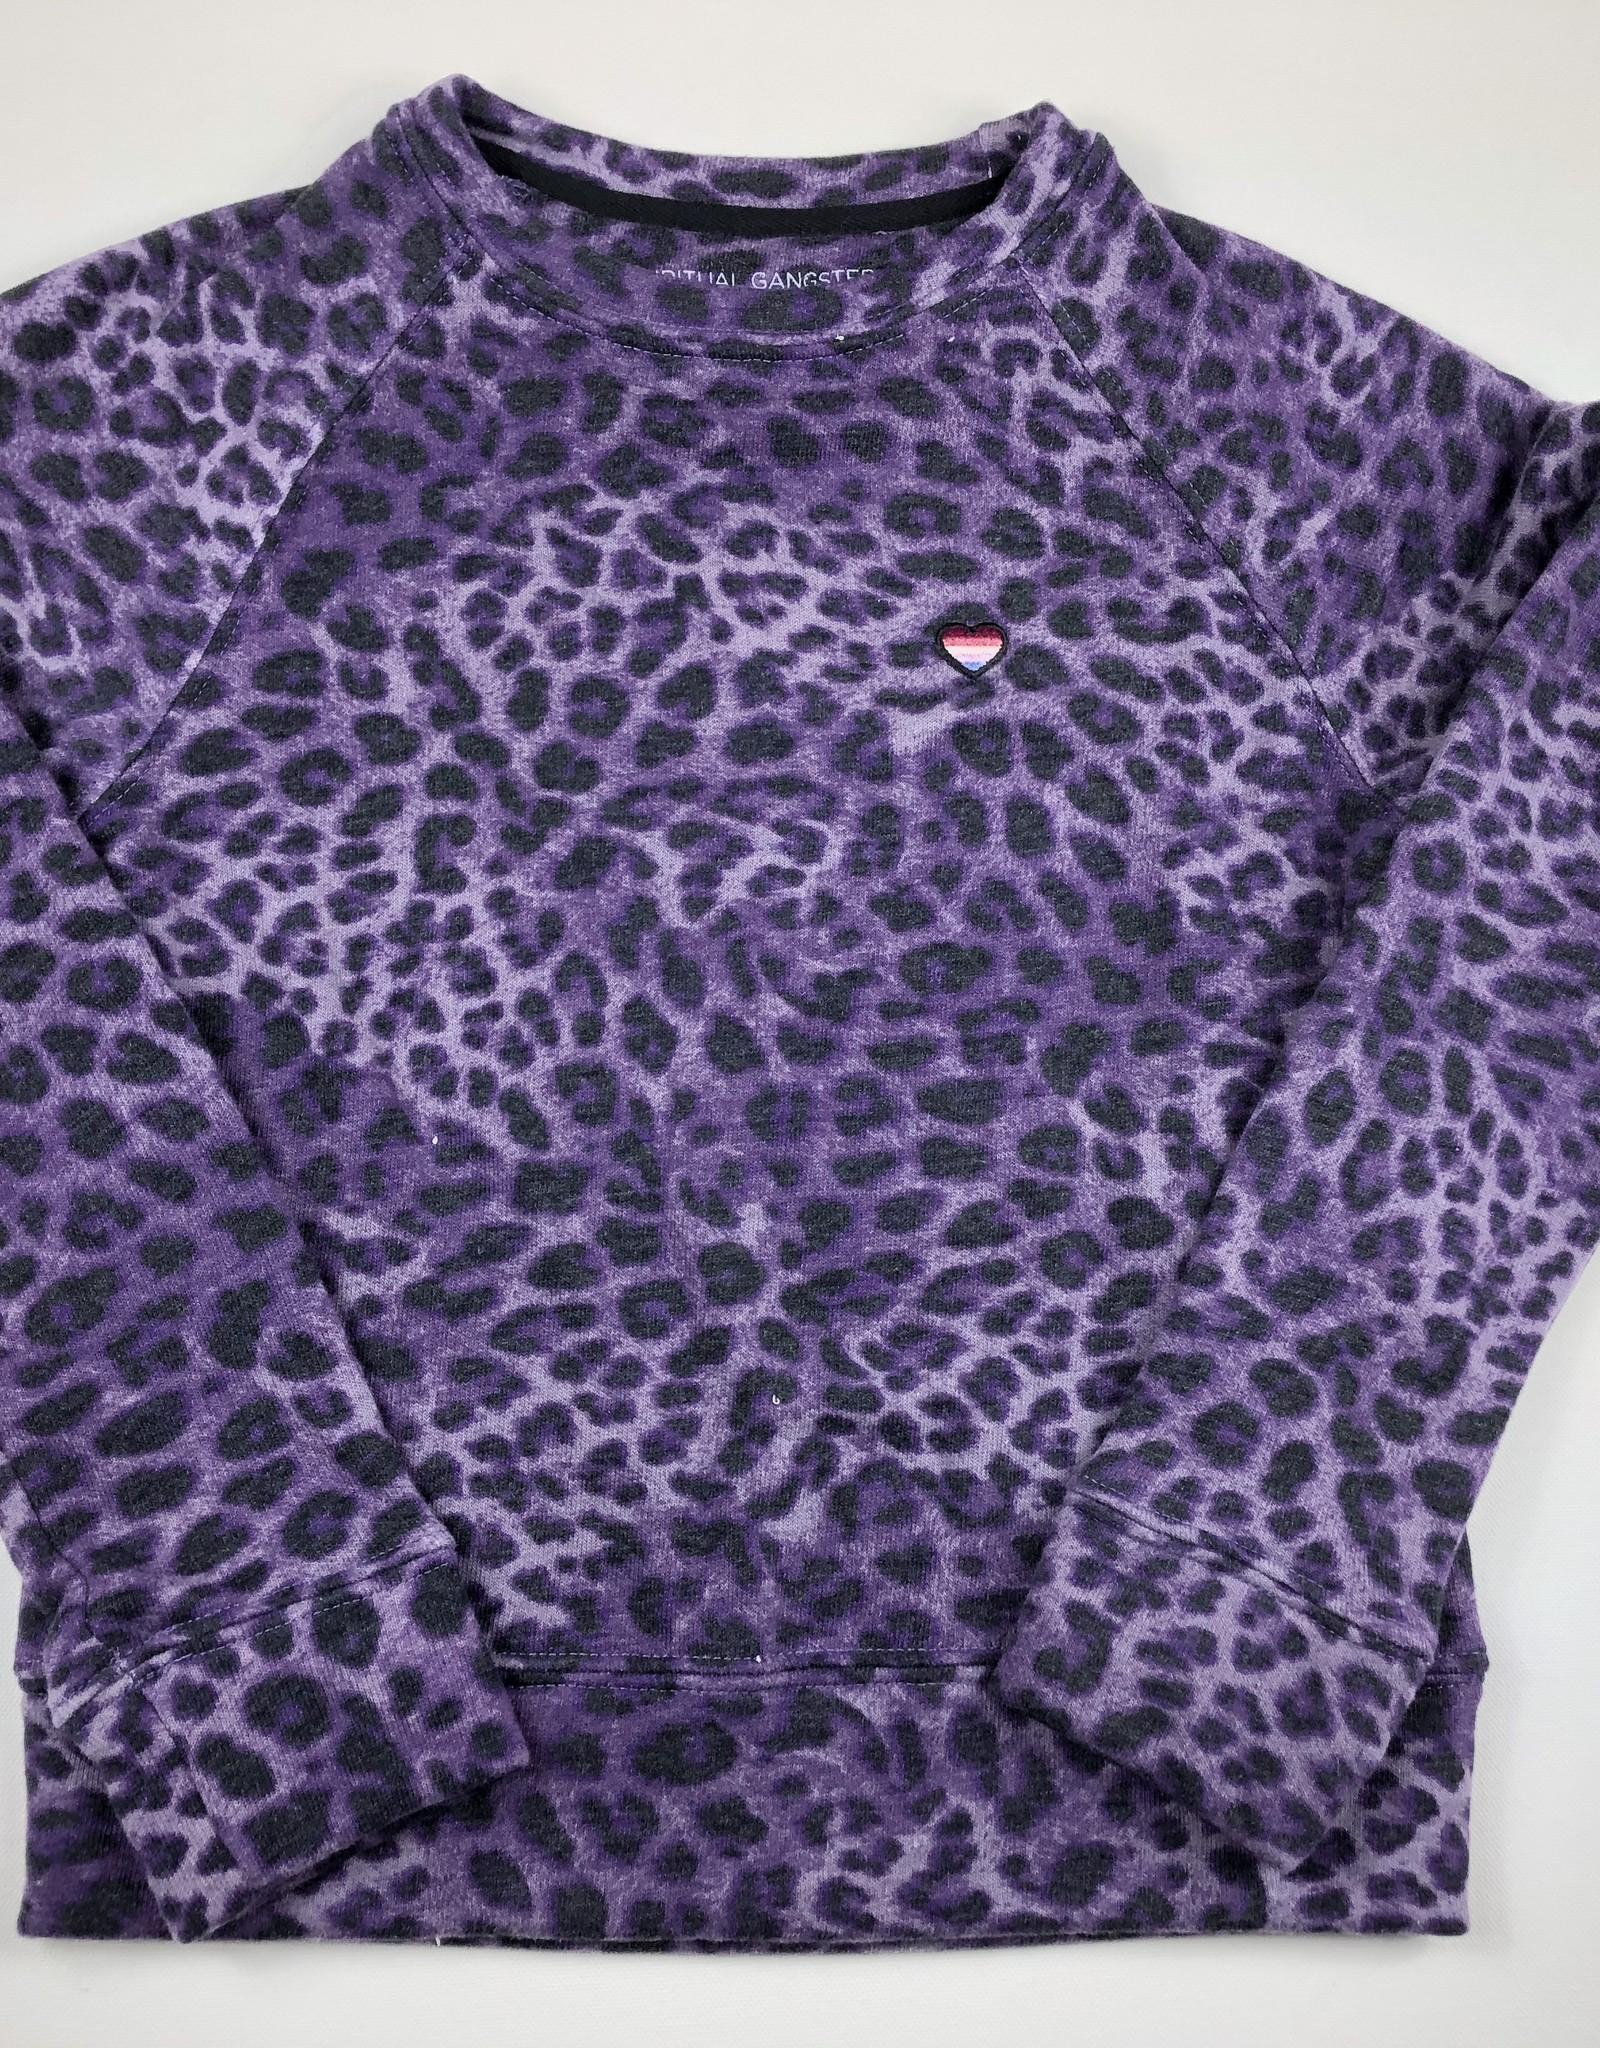 Spiritual Gangster Cheetah Sweatshirt